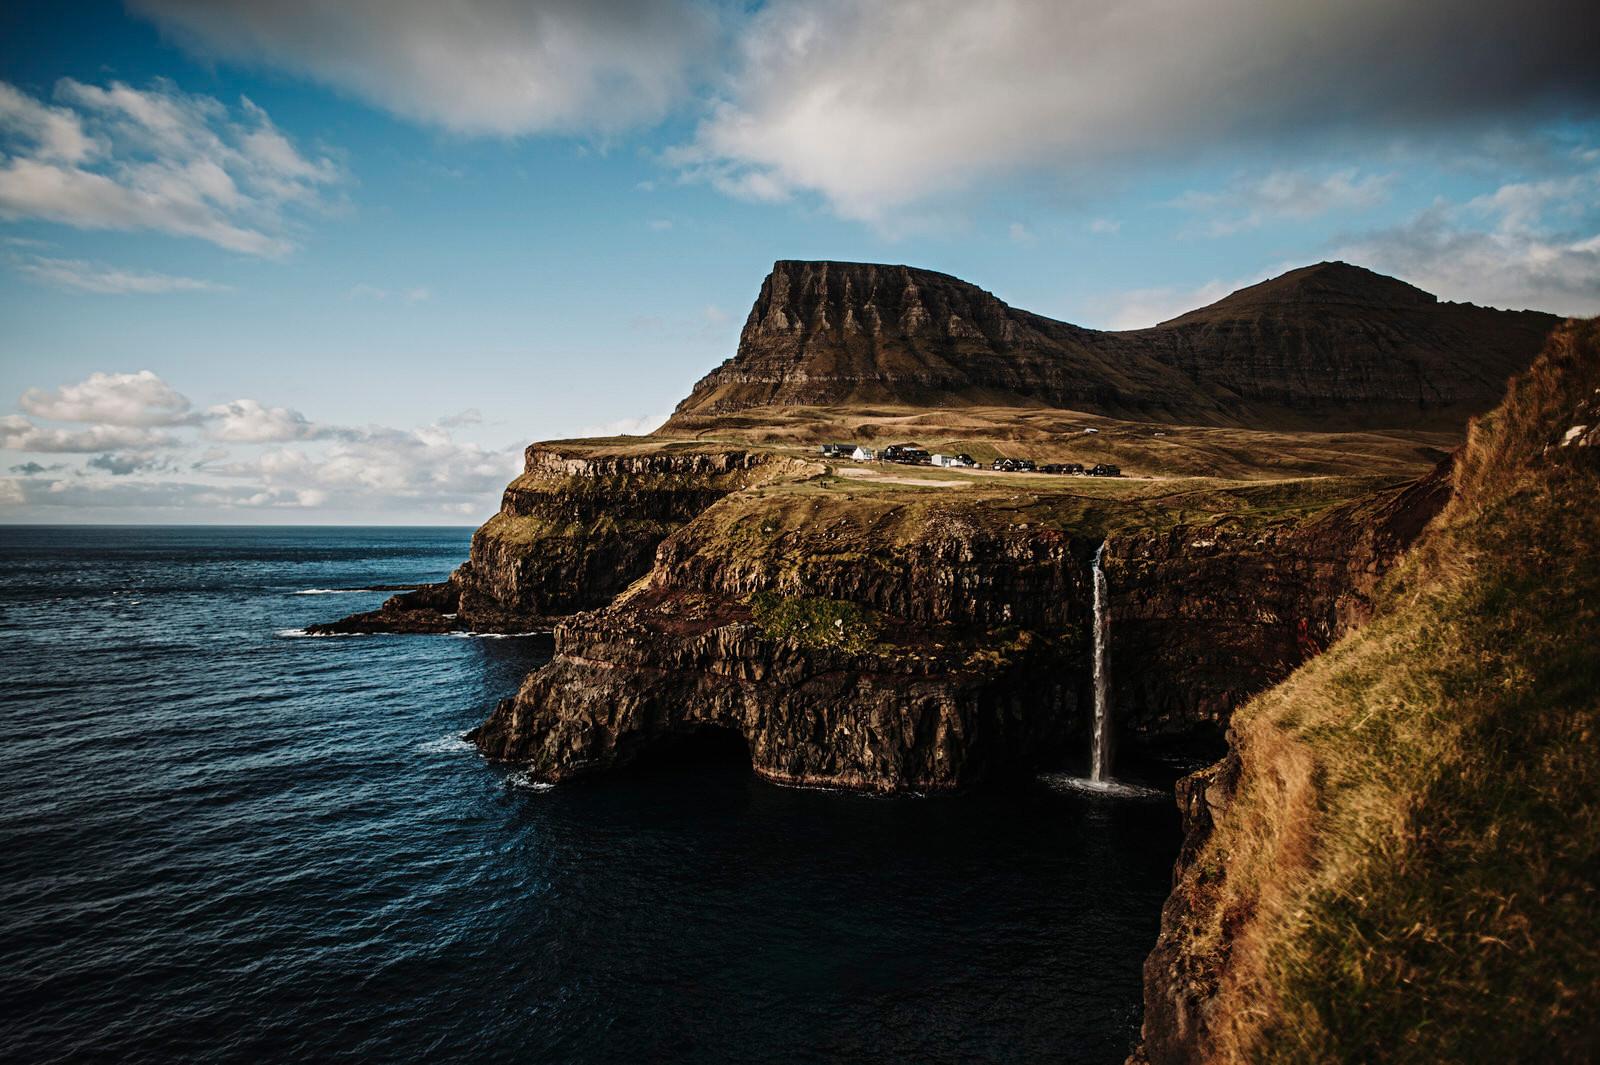 viaggio isole faroe_7.jpg